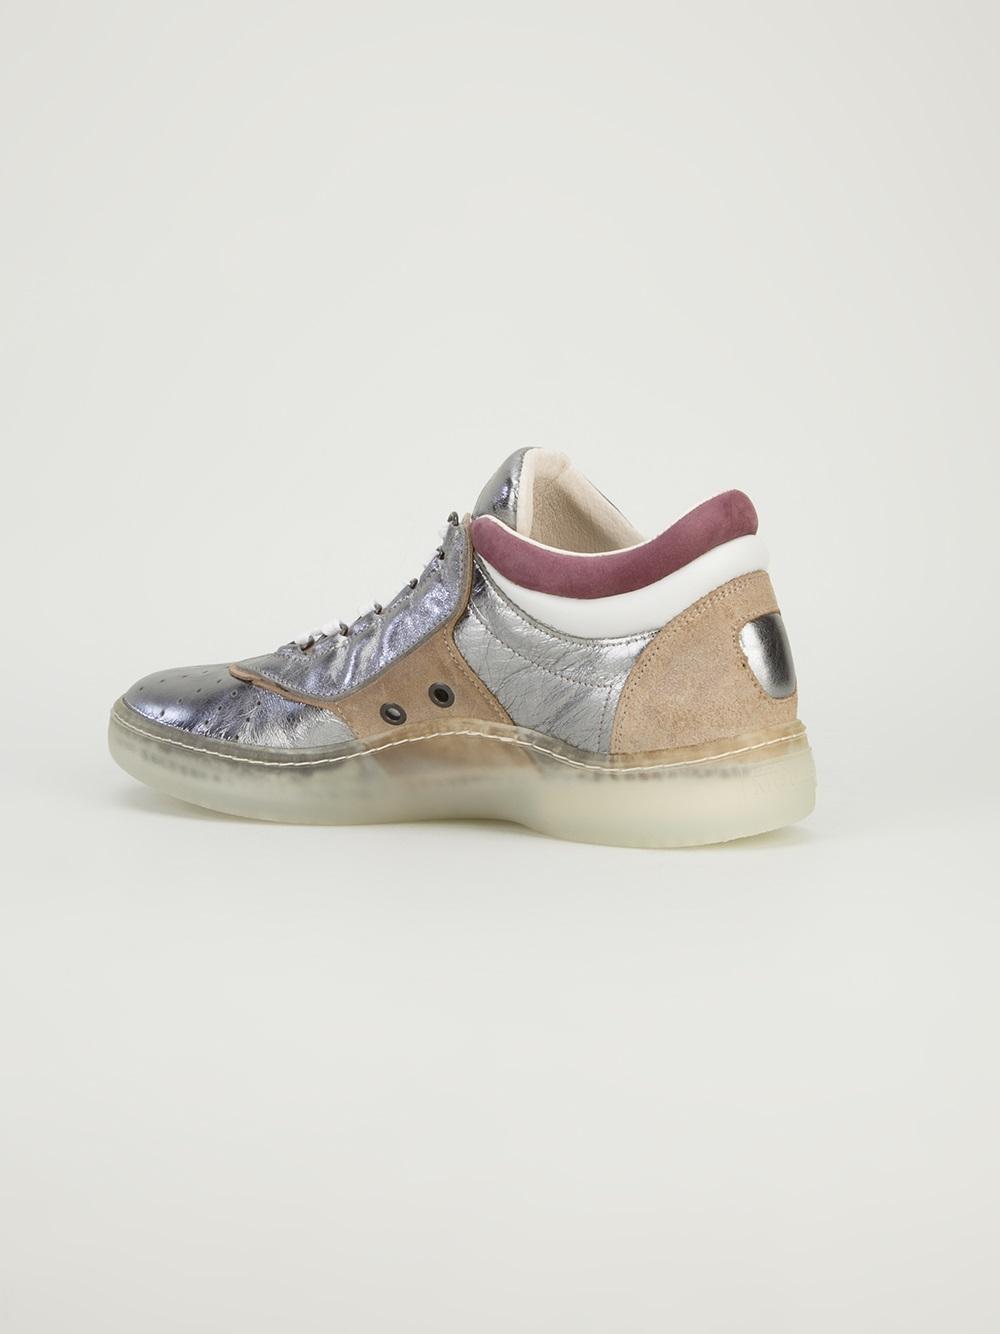 Lyst - Alexander McQueen X Puma Joust Lo Sneaker in Metallic for Men 54000f957